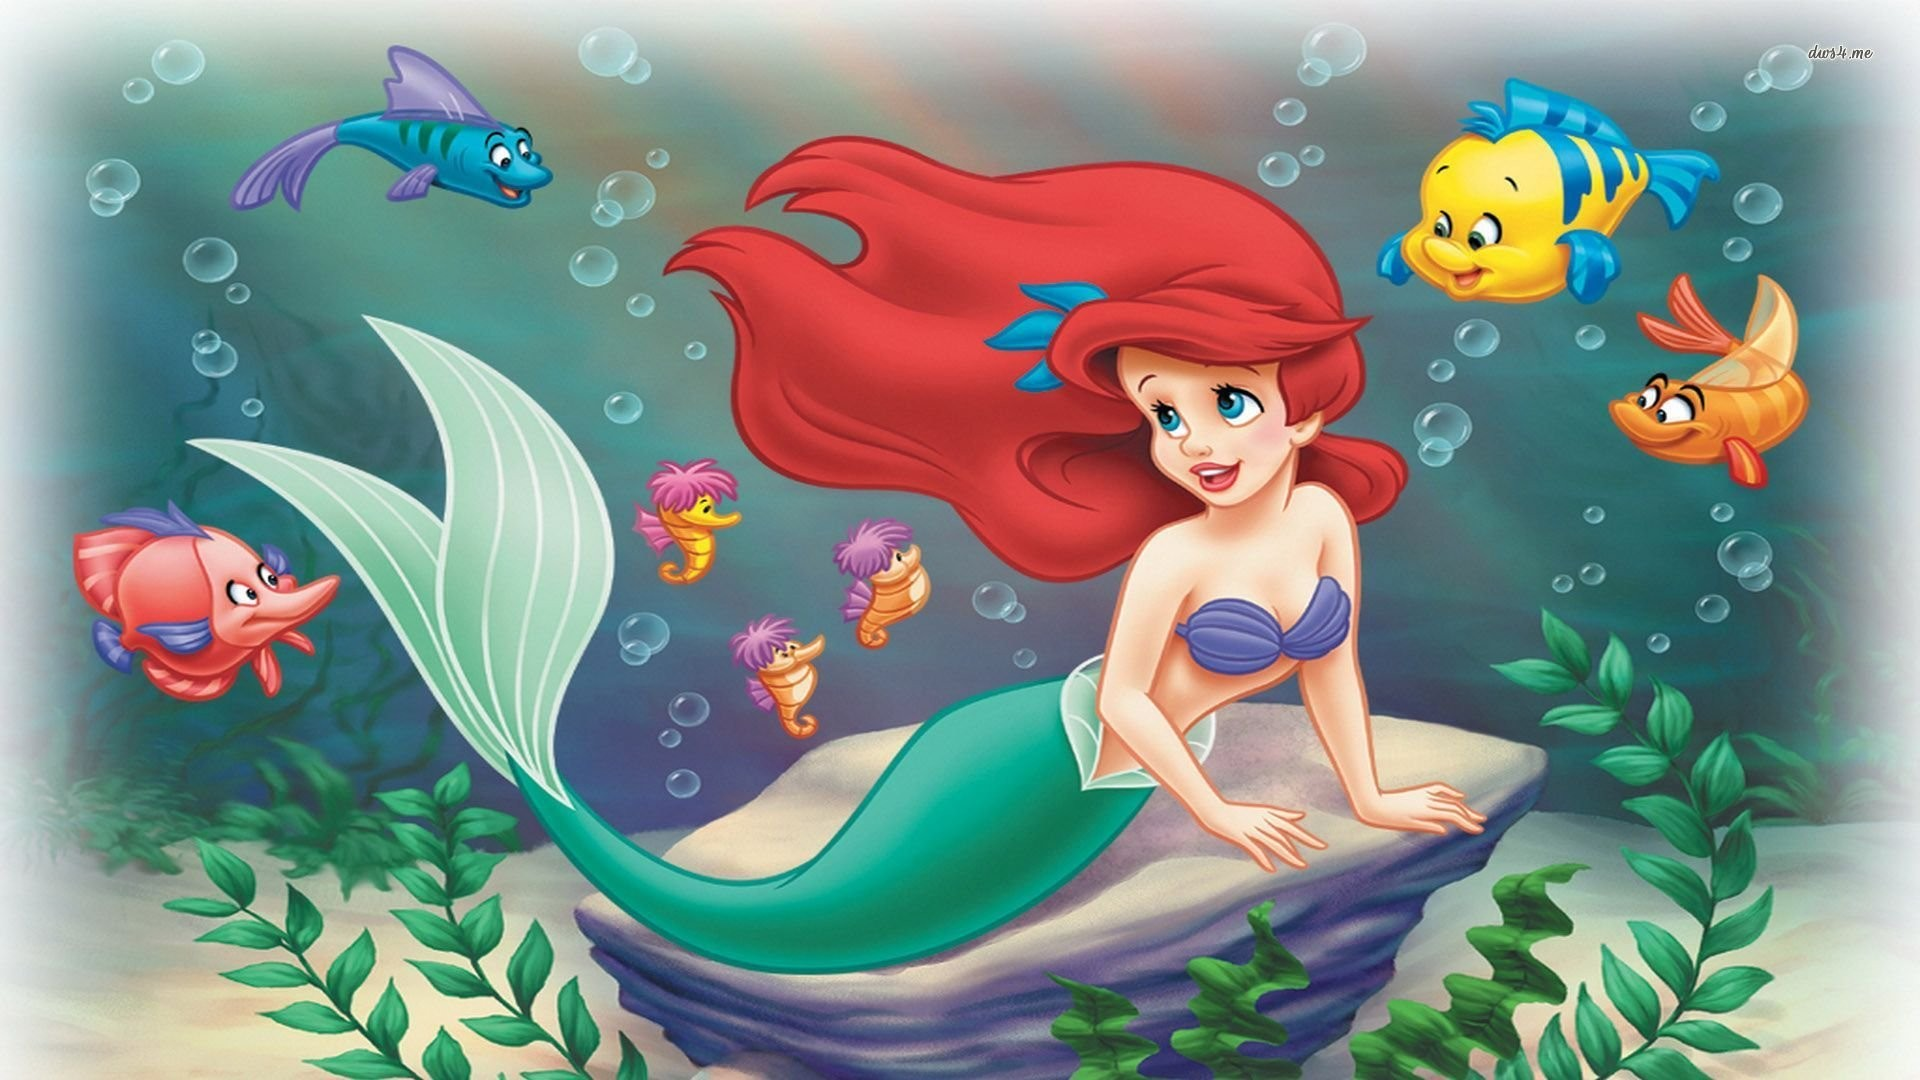 Little Mermaid wallpaper ·① Download free cool HD ... - photo#32